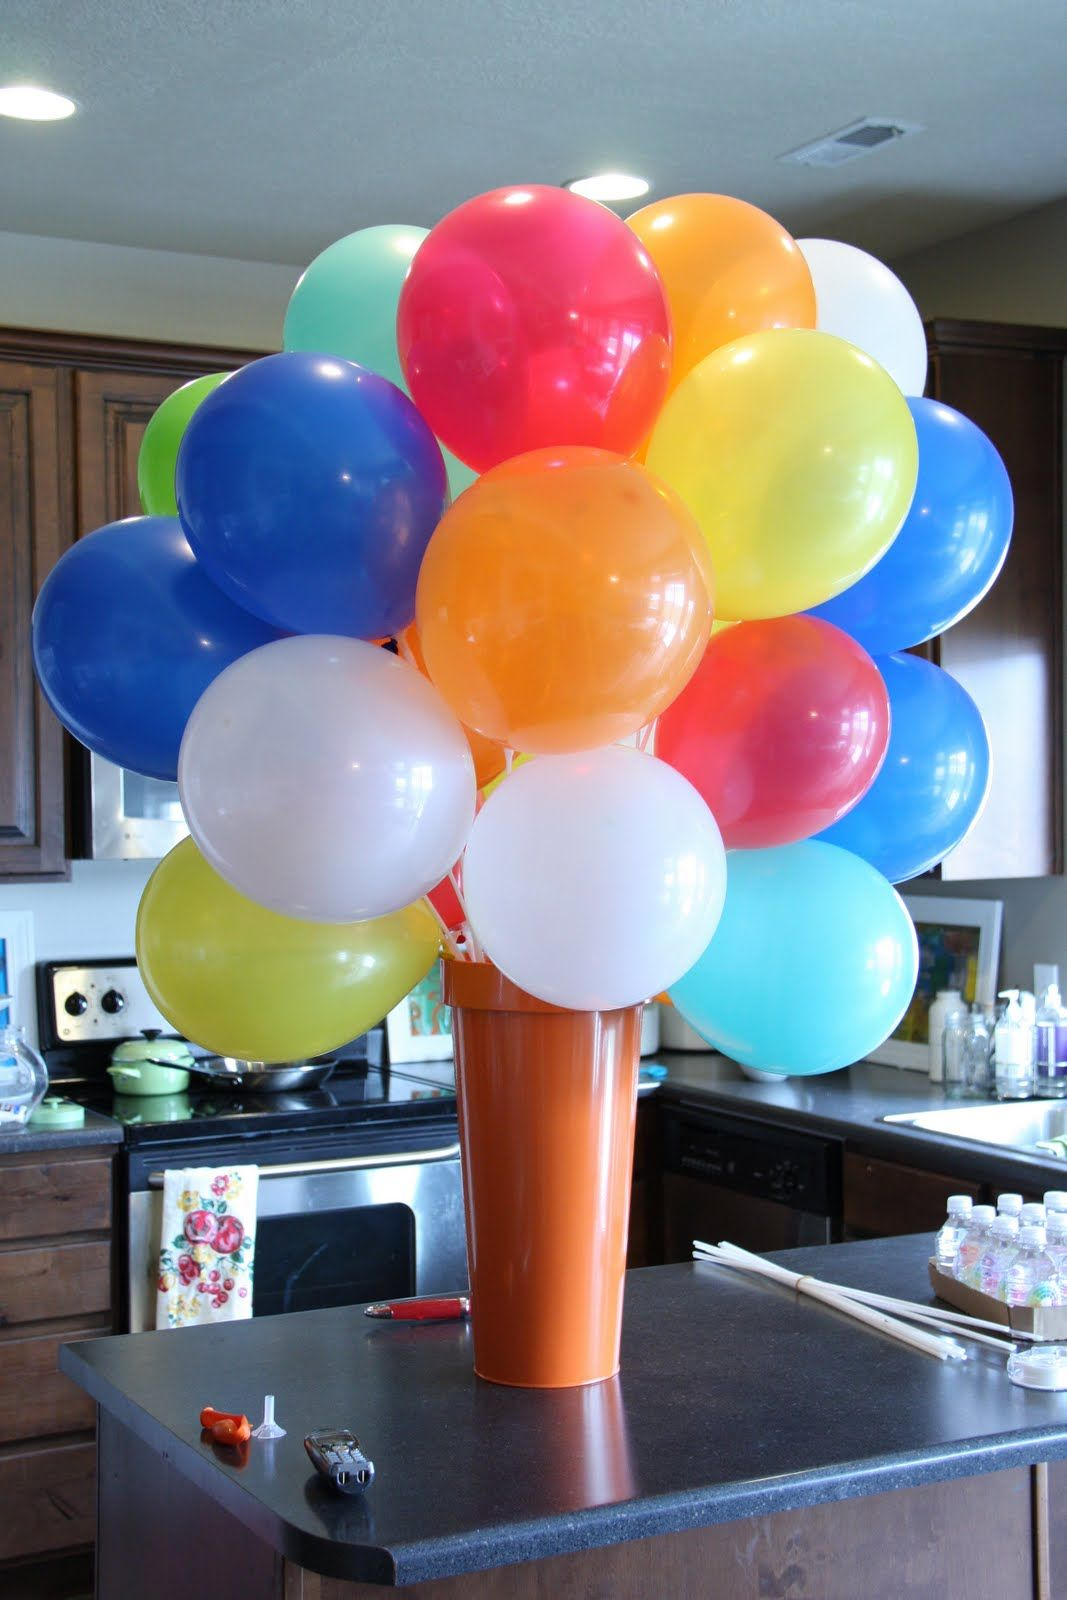 balloons Party balloons, Diy balloon decorations